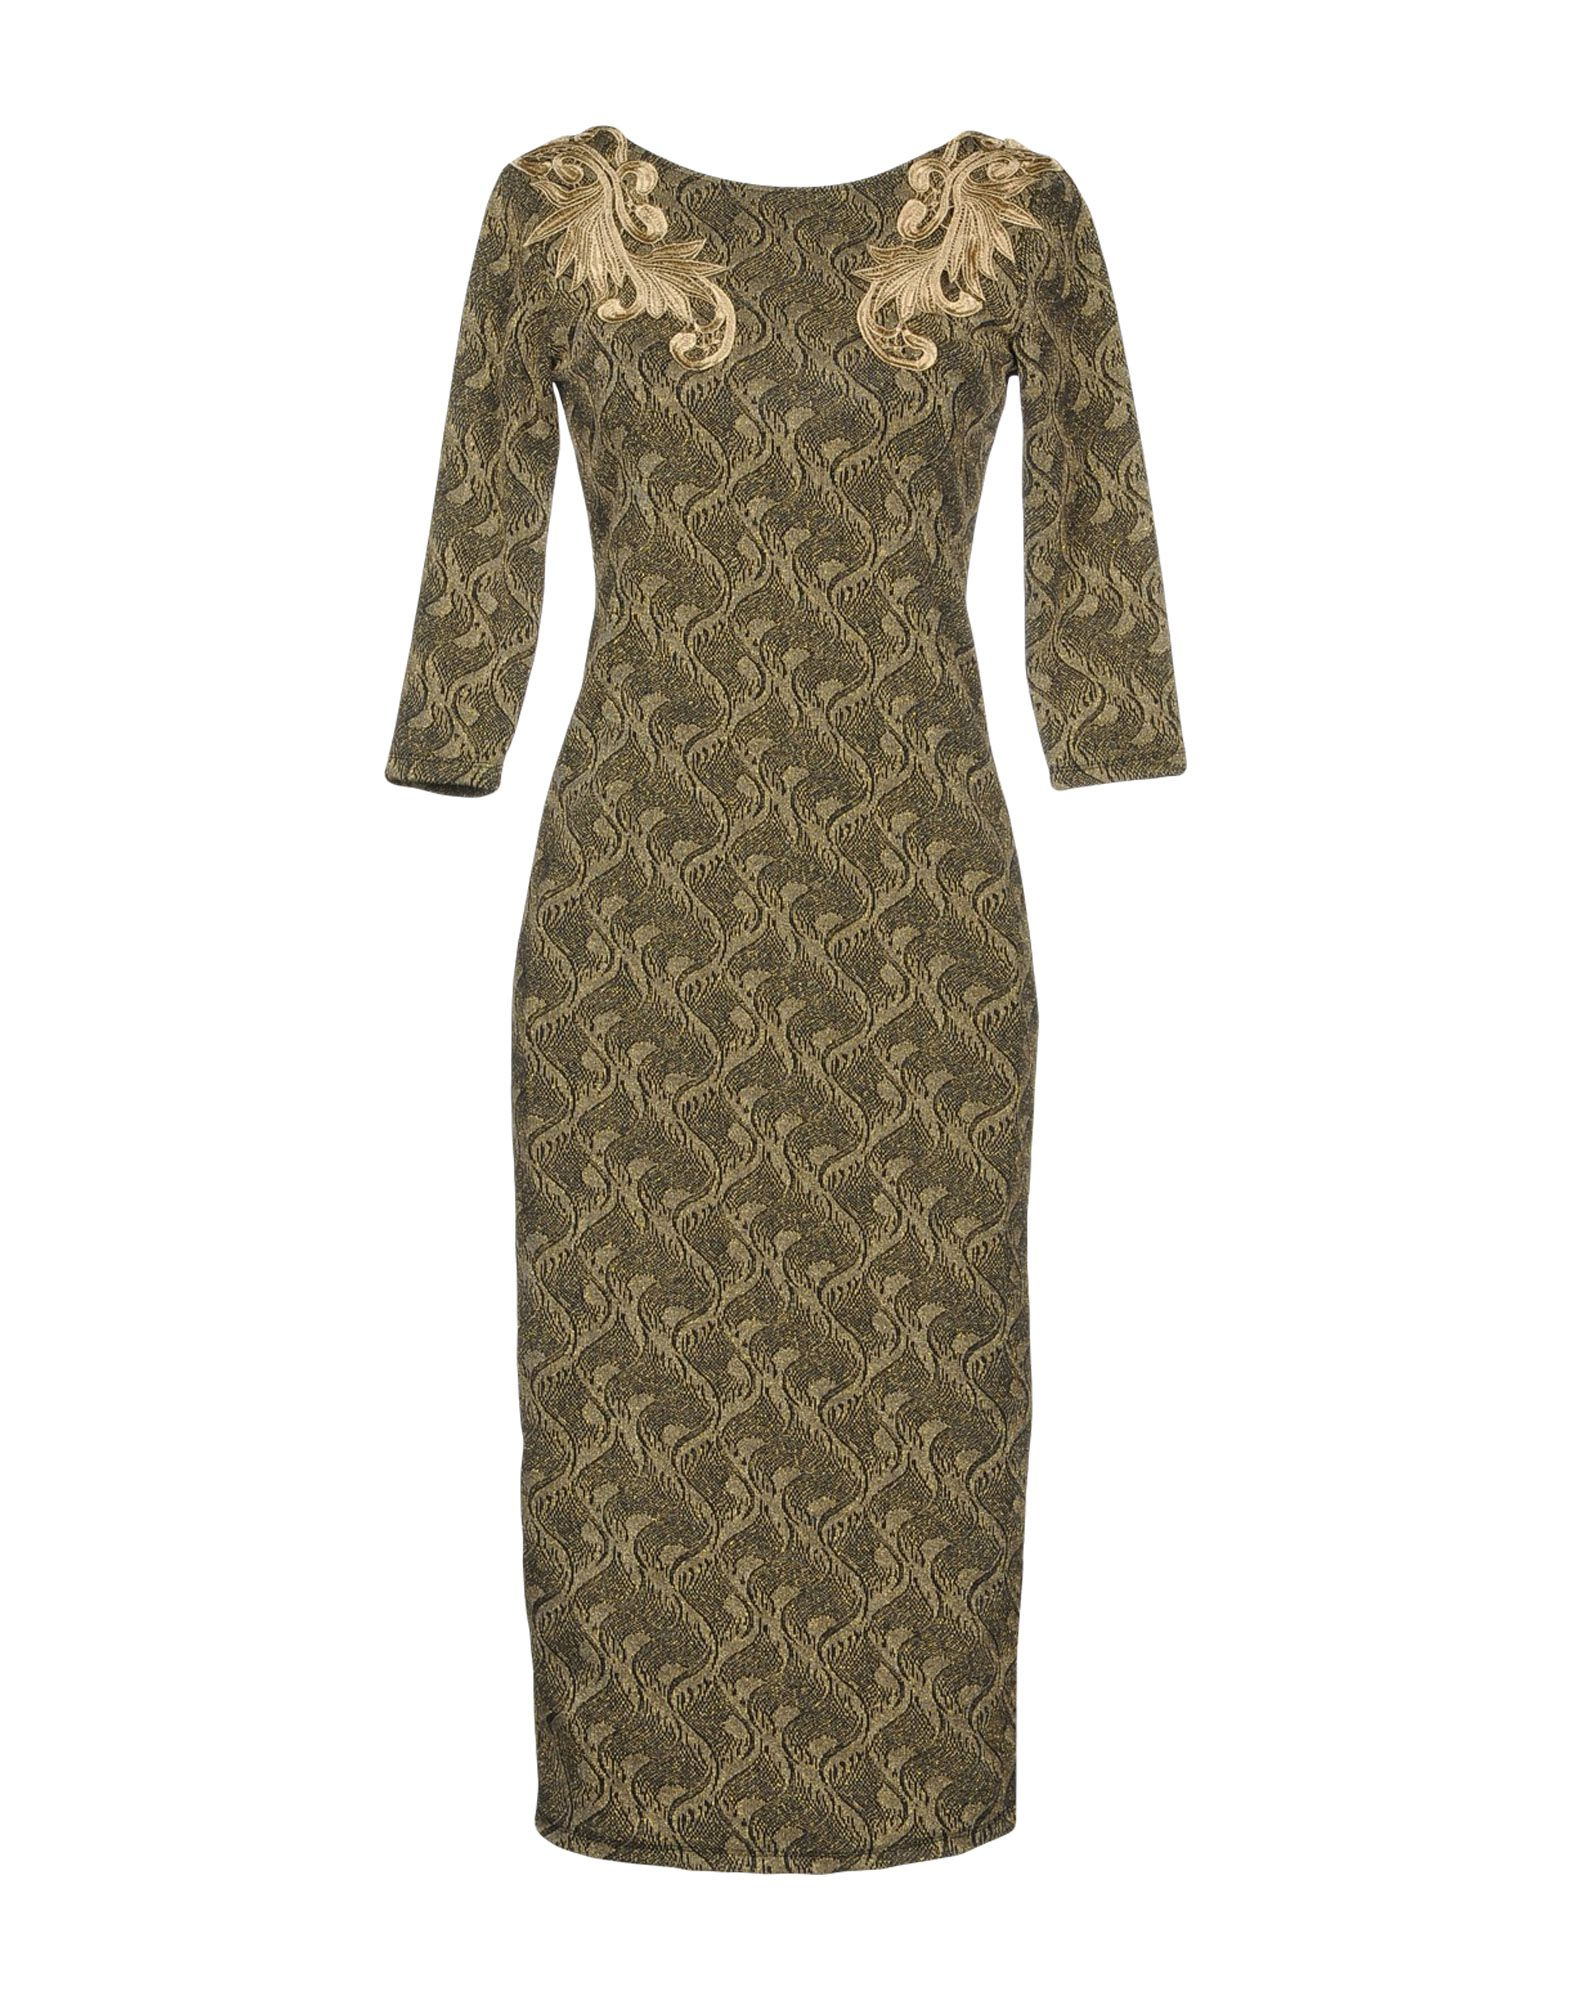 SOALLURE Платье длиной 3/4 tenax платье длиной 3 4